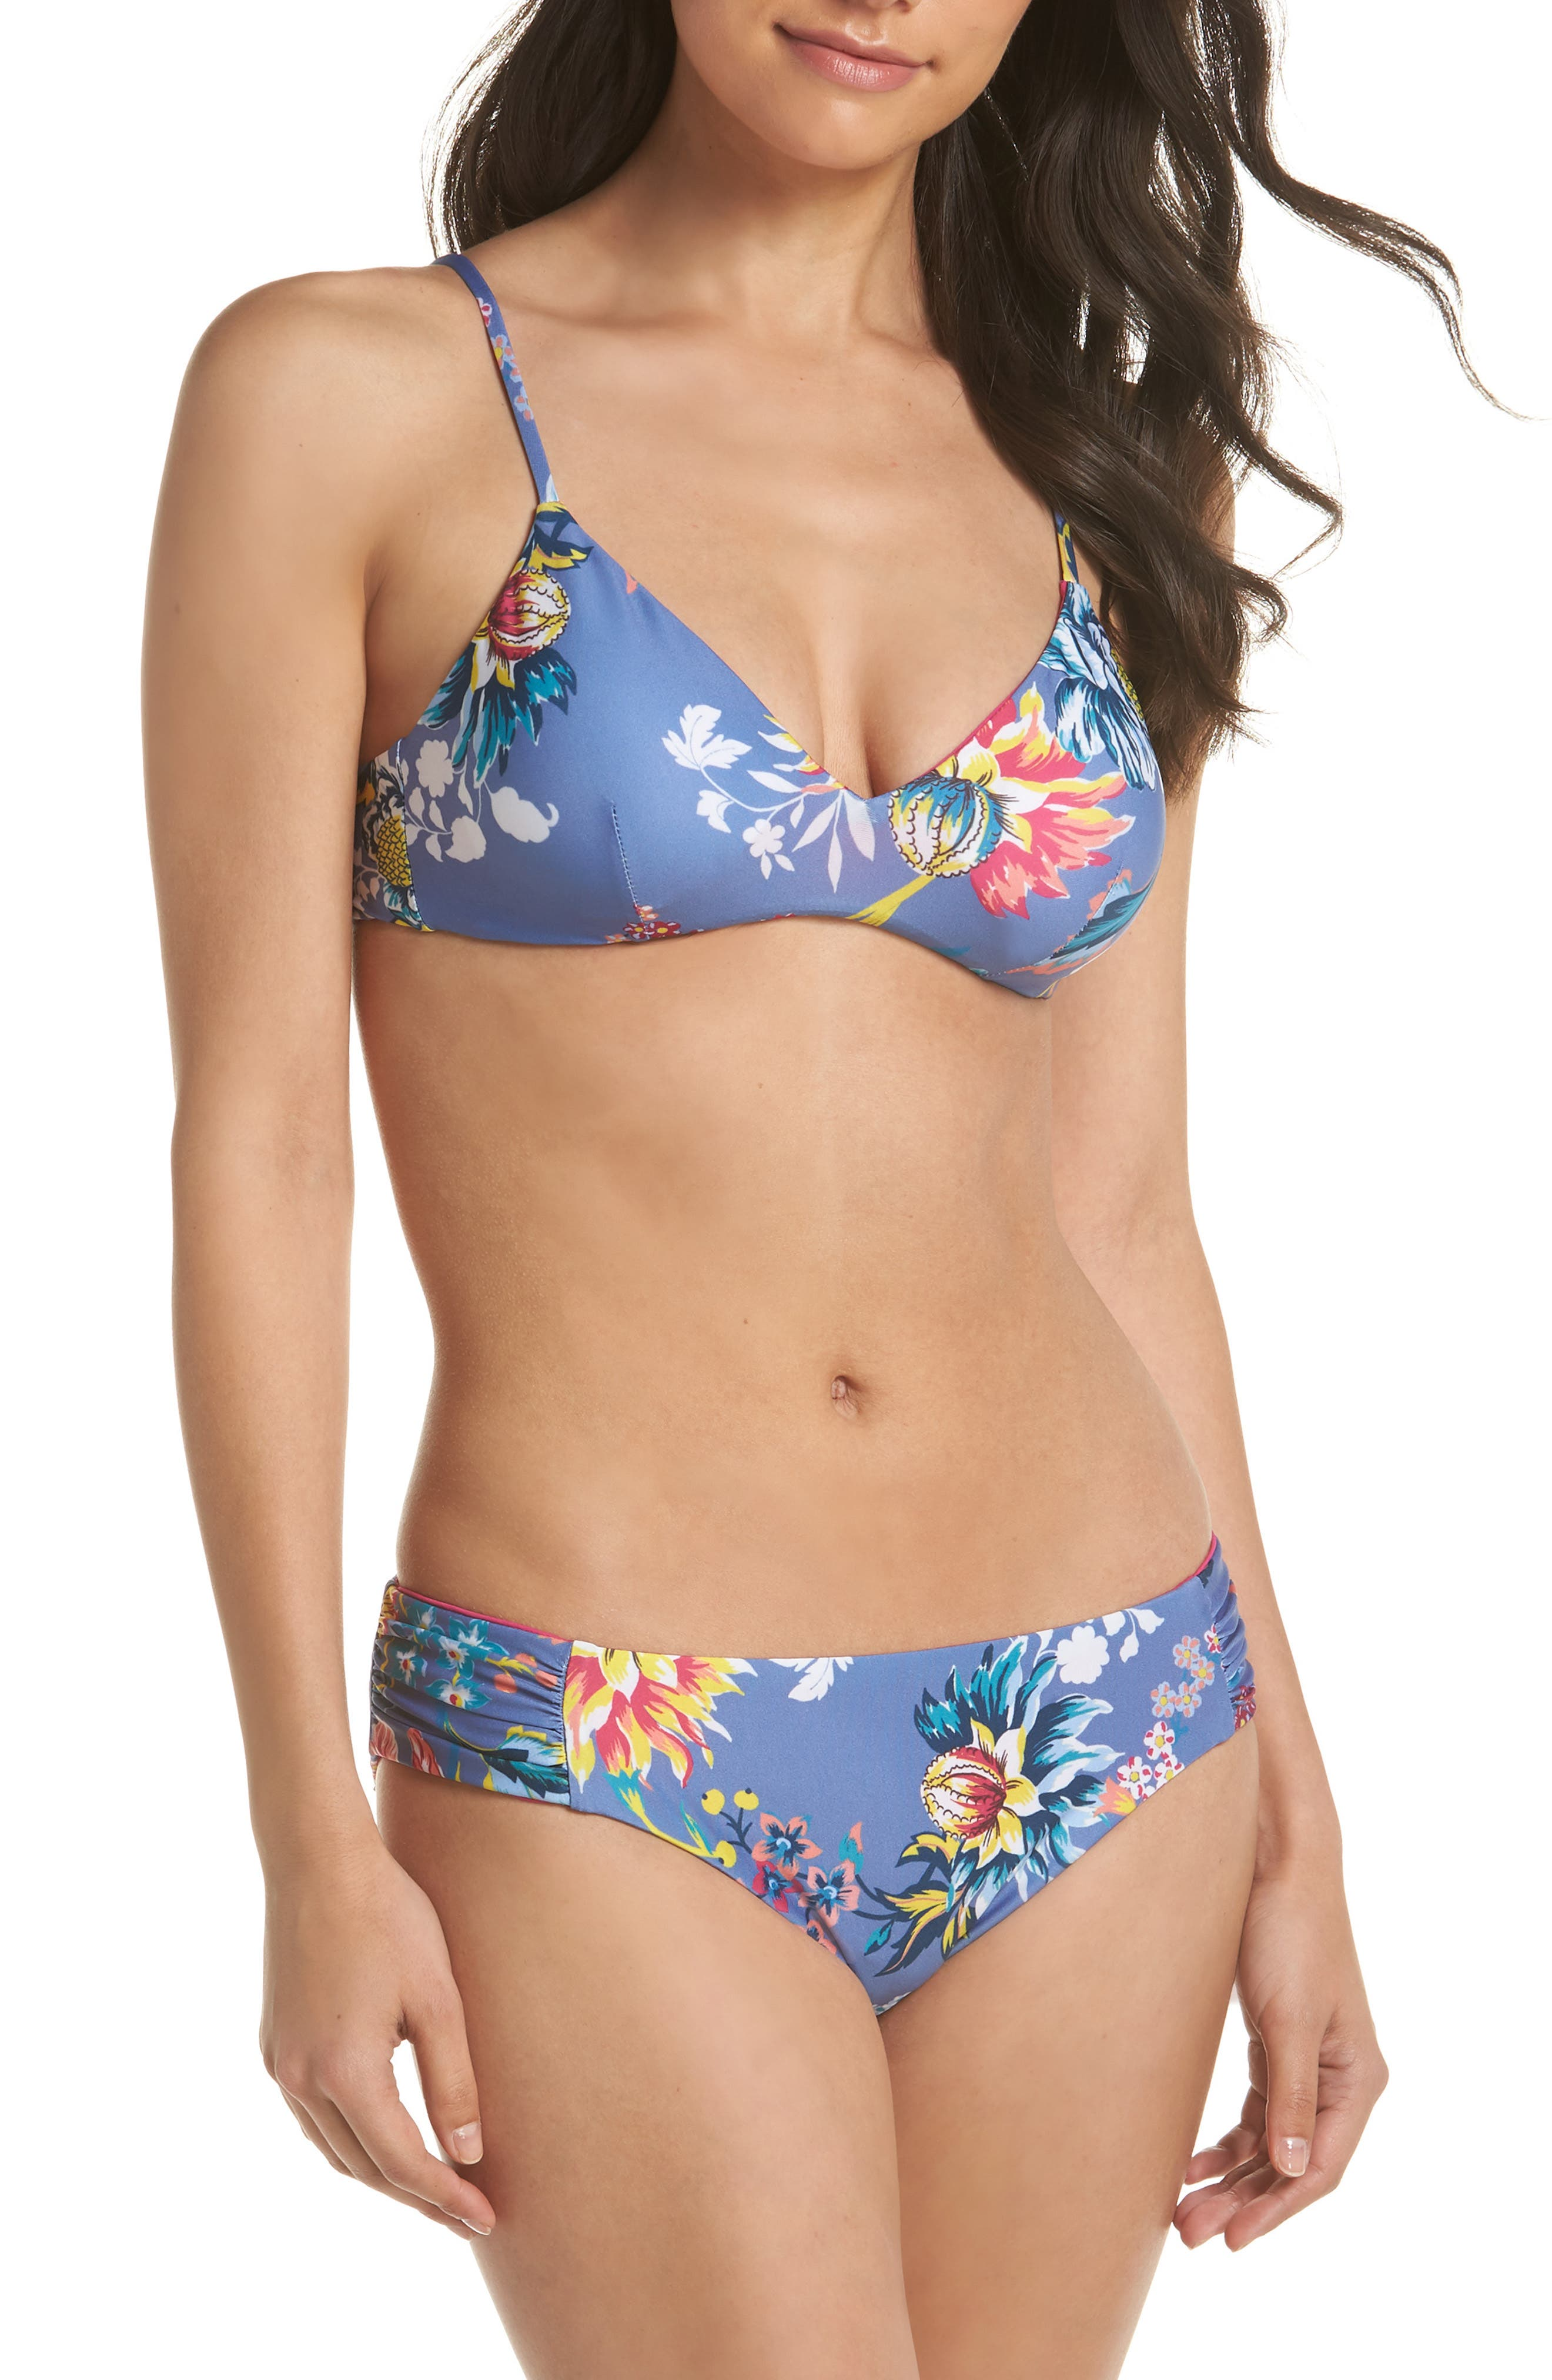 Victoria Garden Reversible Bikini Bottoms,                             Alternate thumbnail 5, color,                             Purple/ Blue Multi